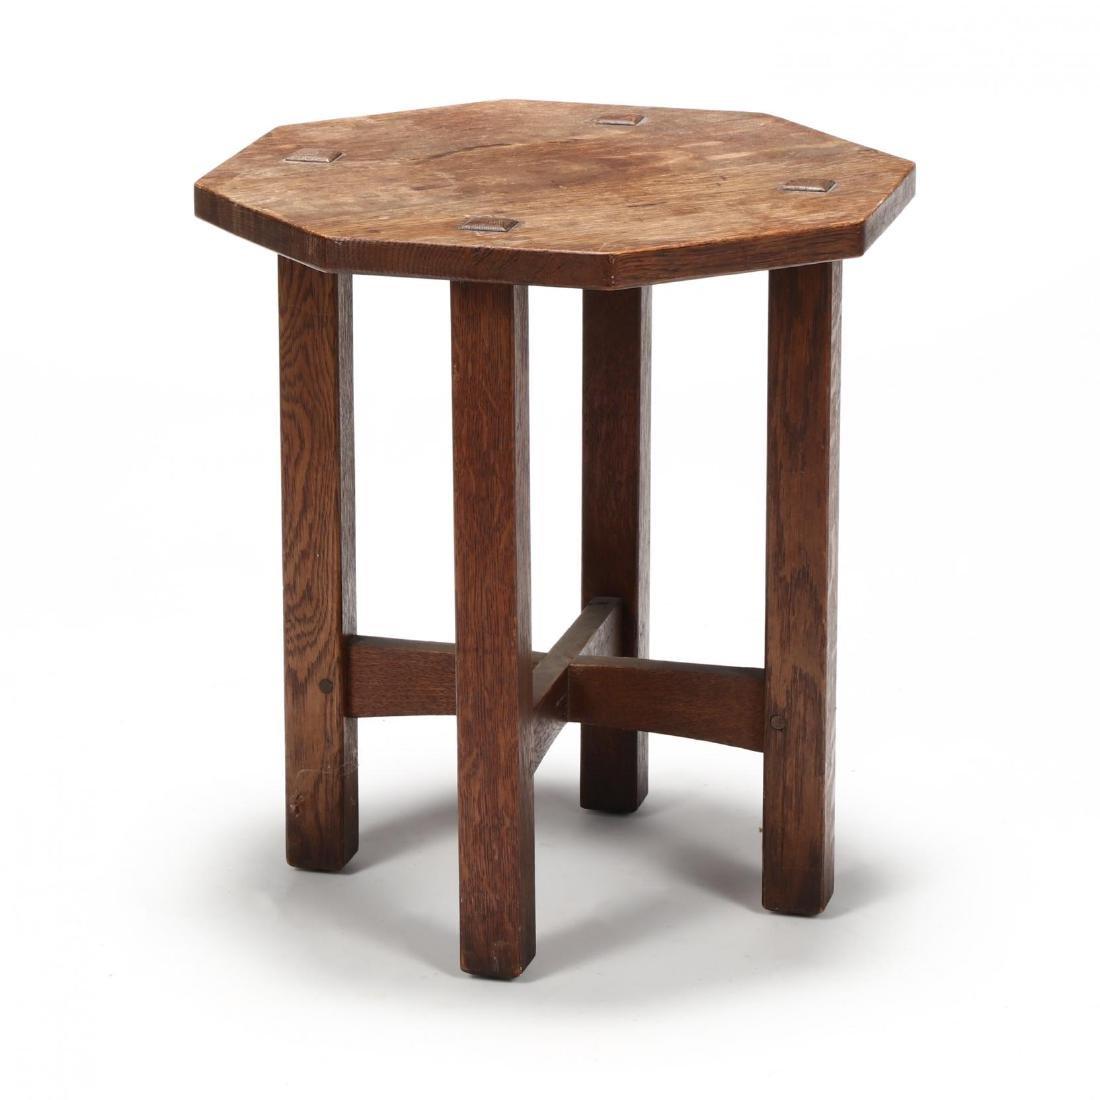 L. J. G. Stickley, Misson Oak Low Table